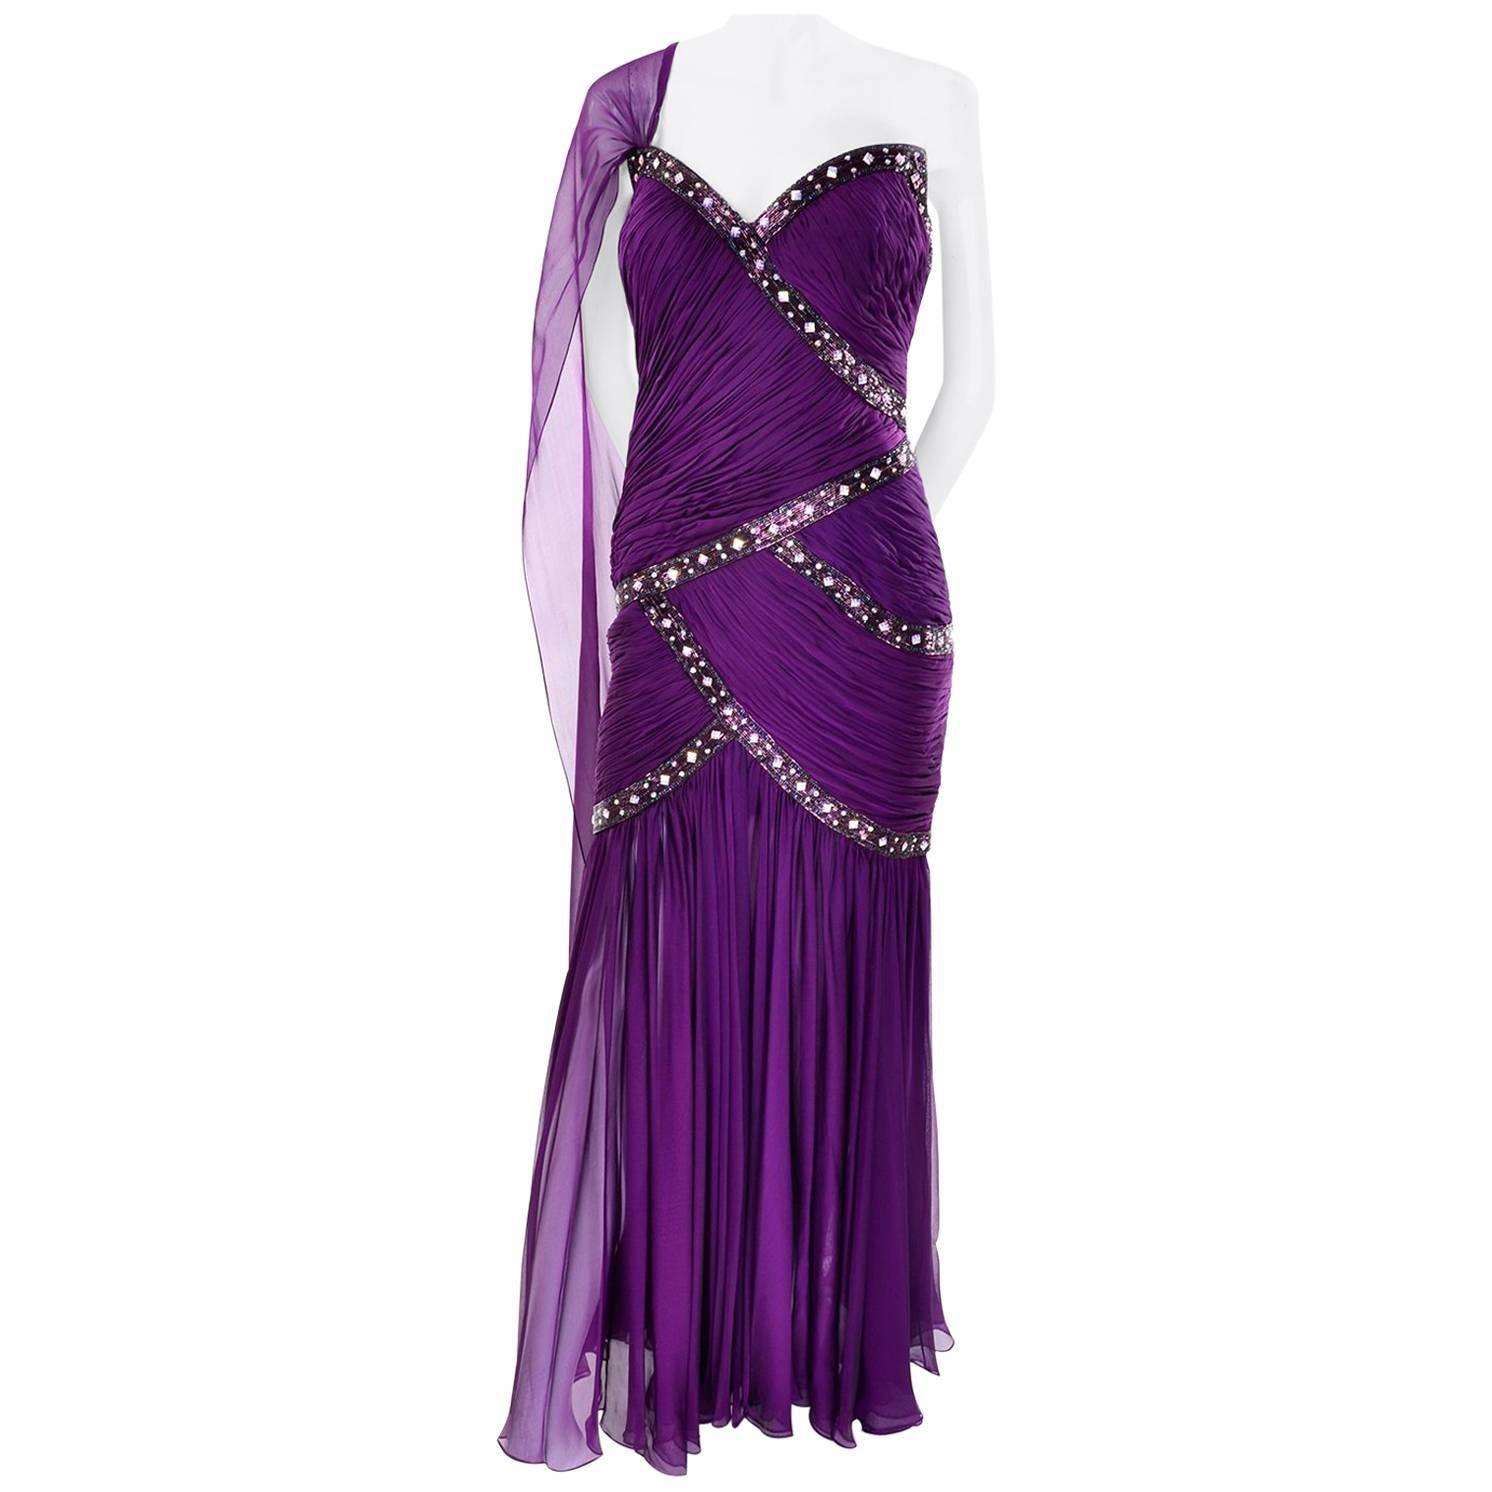 Michael Casey Vintage Dress in Purple Silk Beaded Chiffon Evening Gown